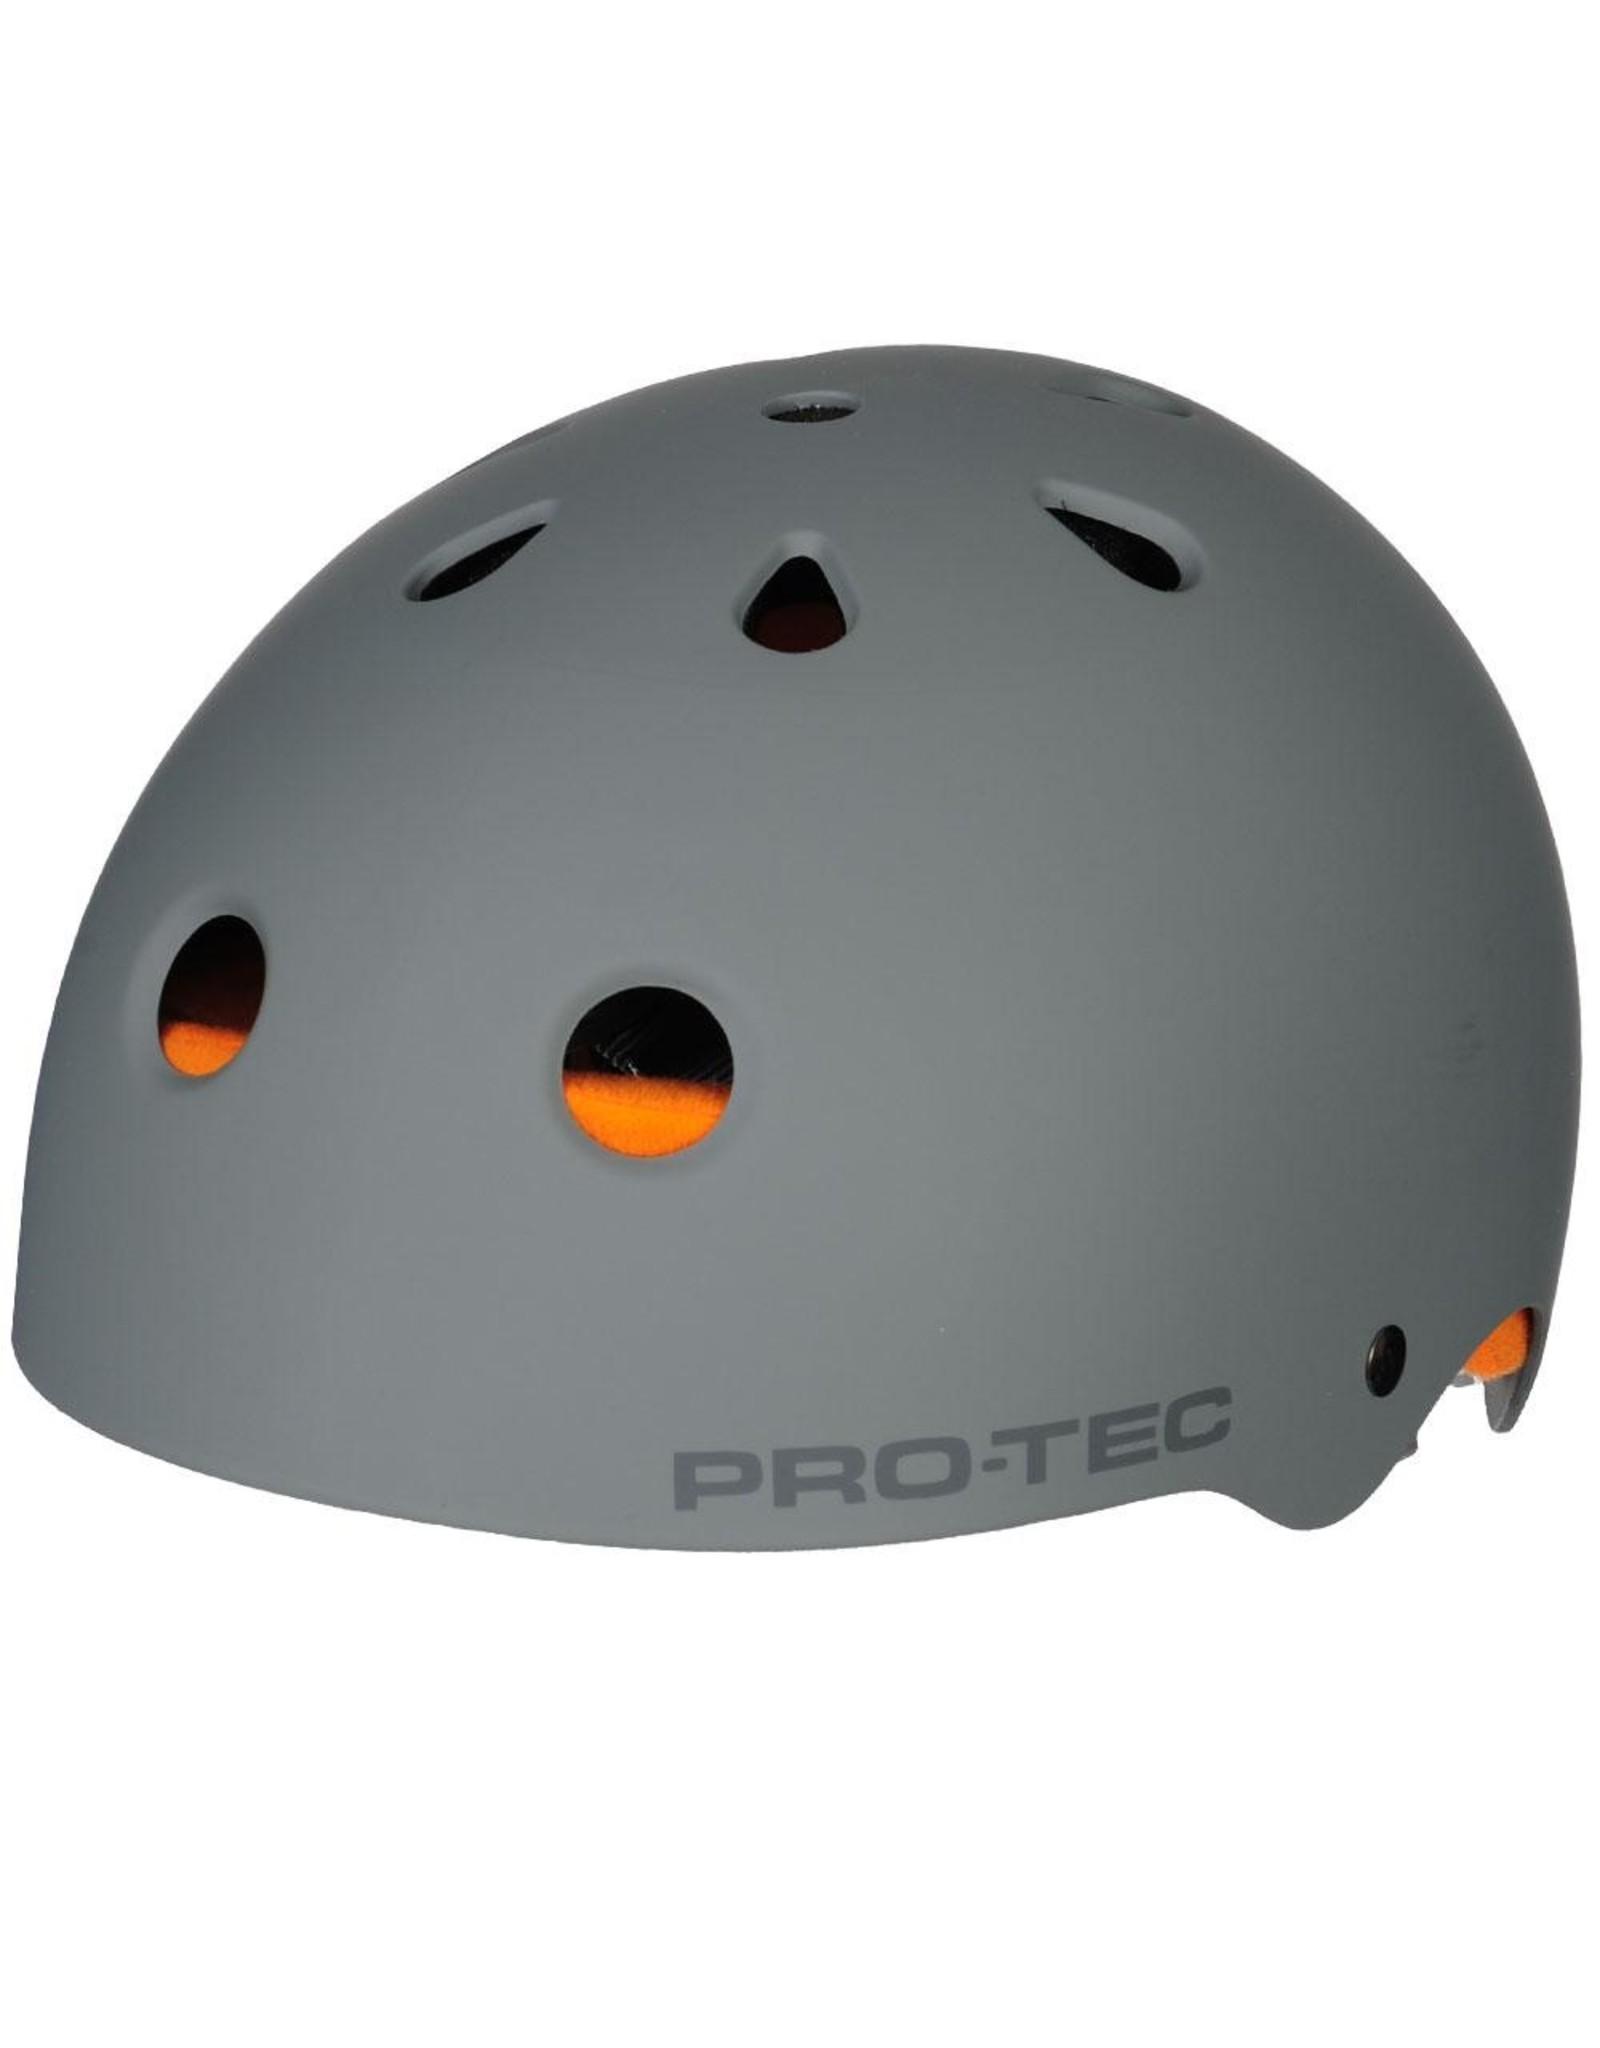 PRO-TEC PRO TEC - CLASSIC SKATE MATTE GRAY